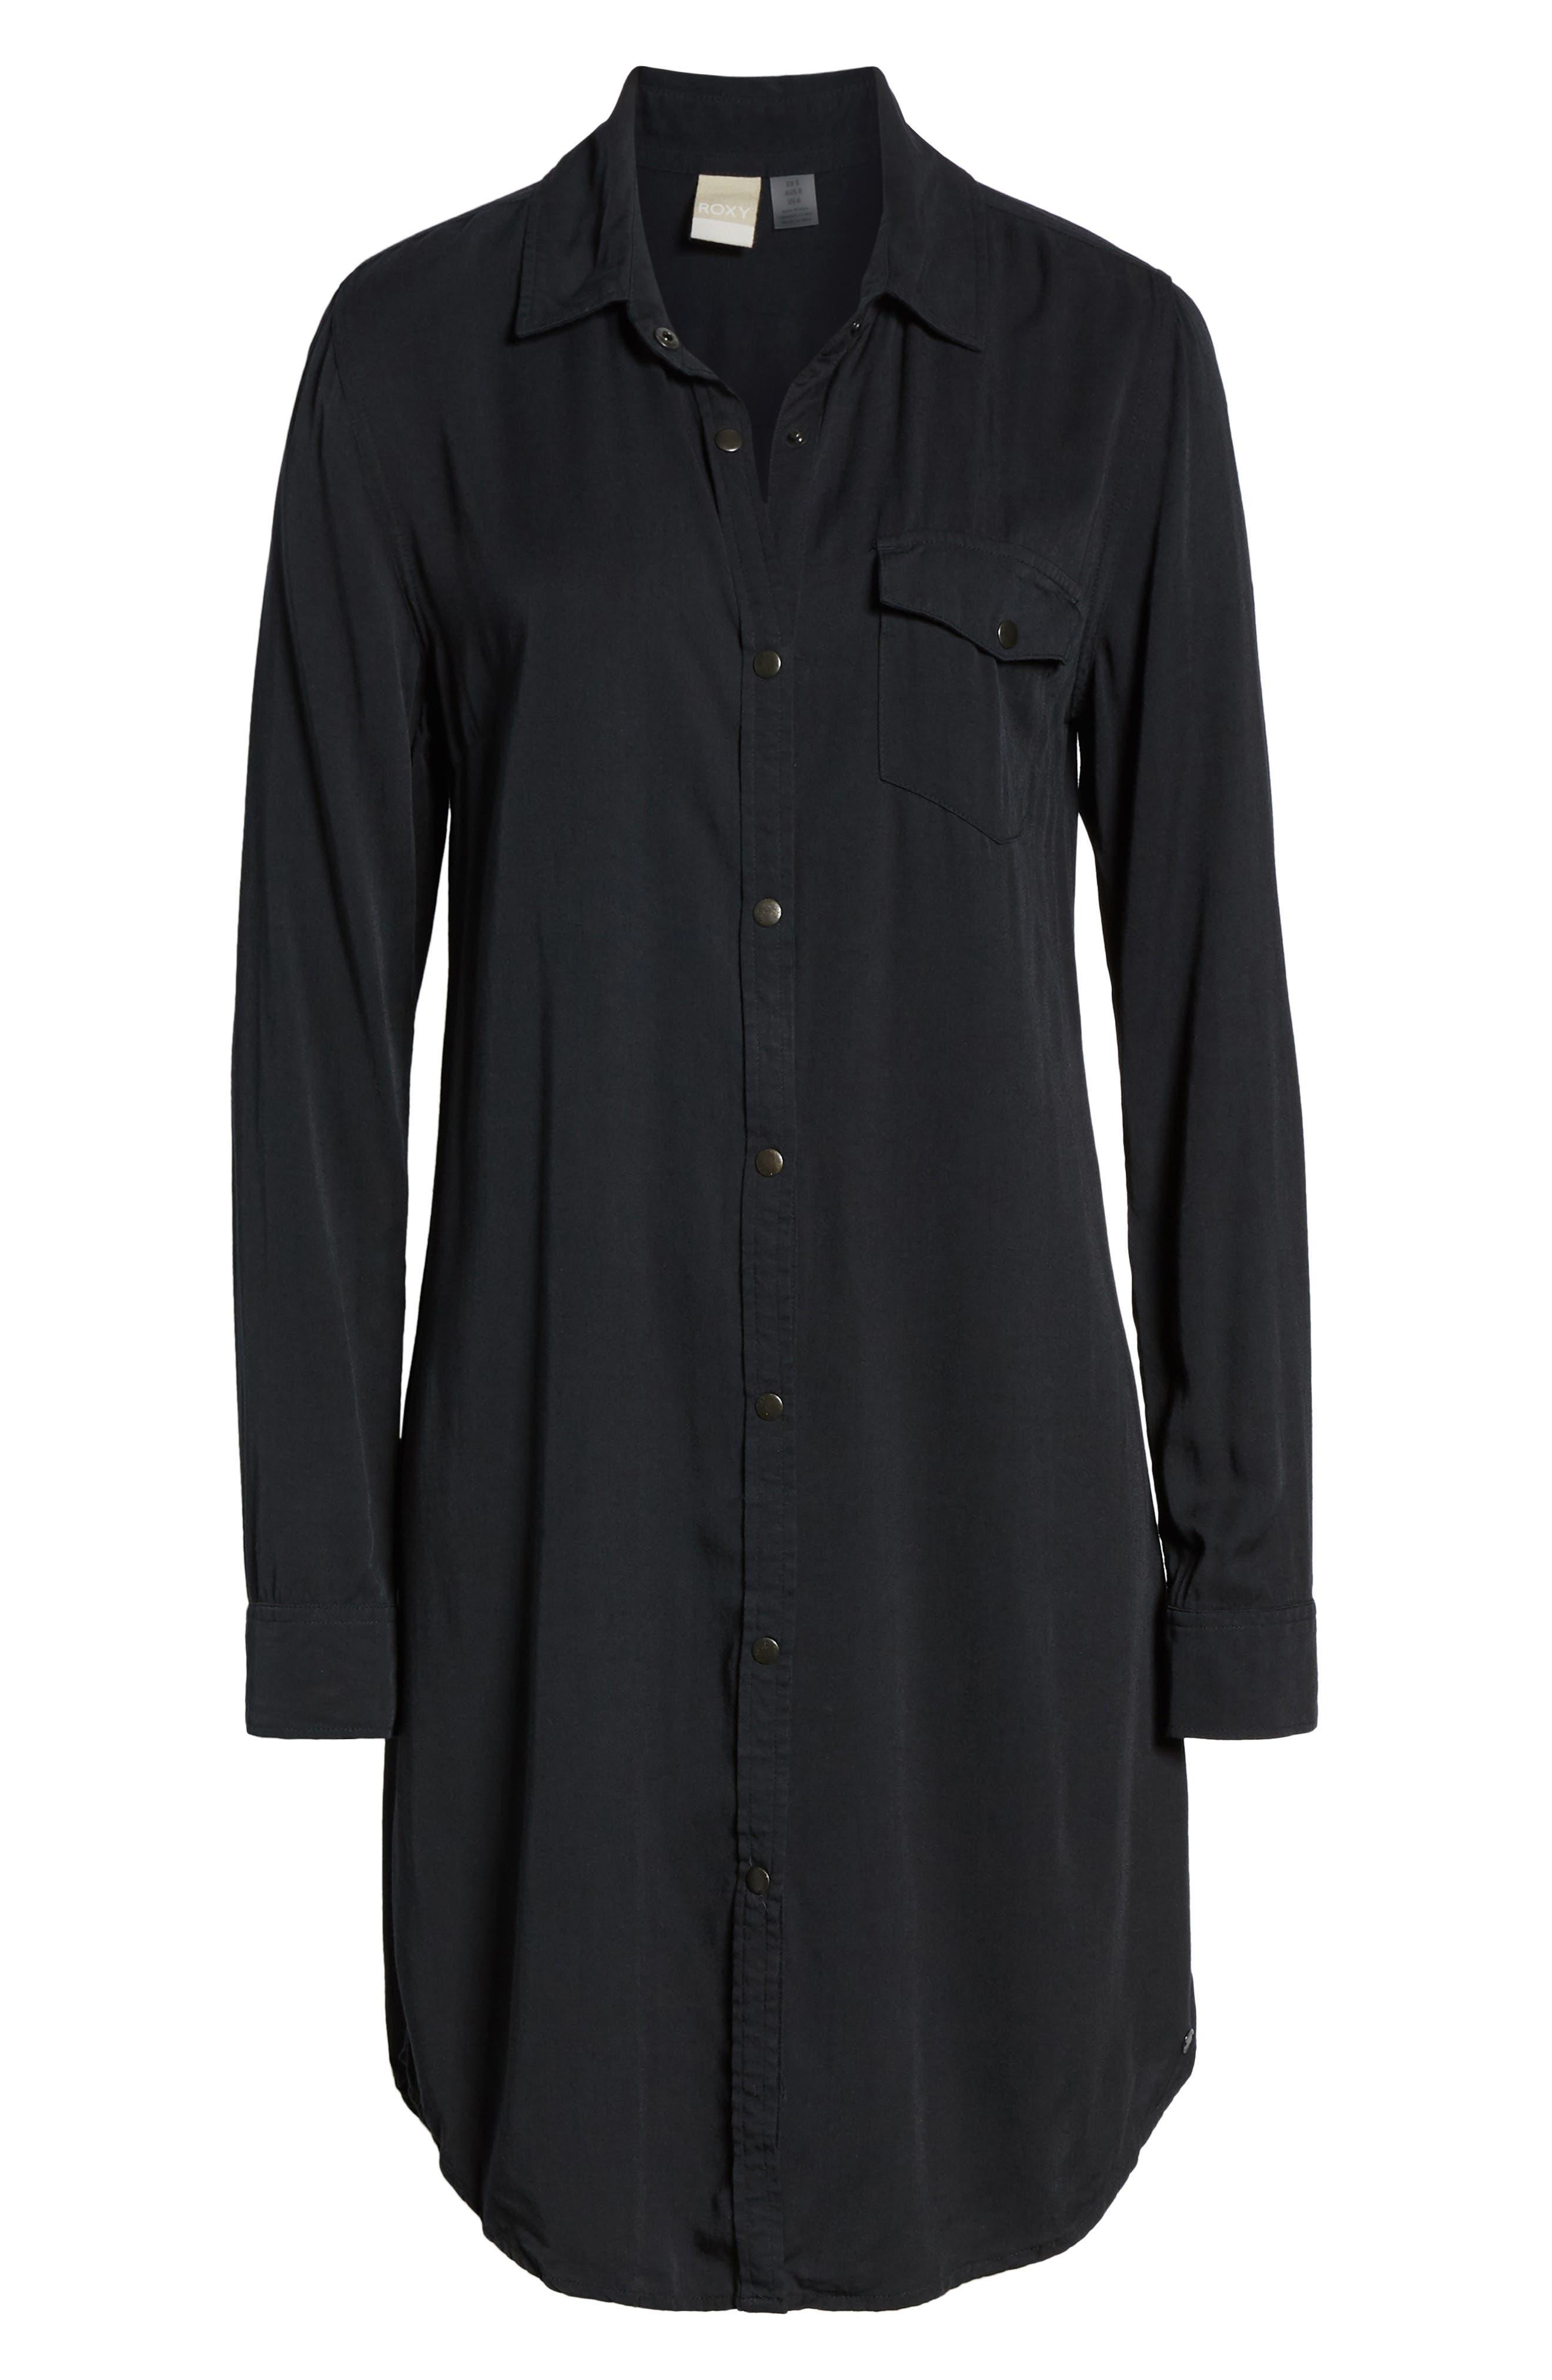 Tomini Bay View Shirtdress,                             Alternate thumbnail 7, color,                             TRUE BLACK